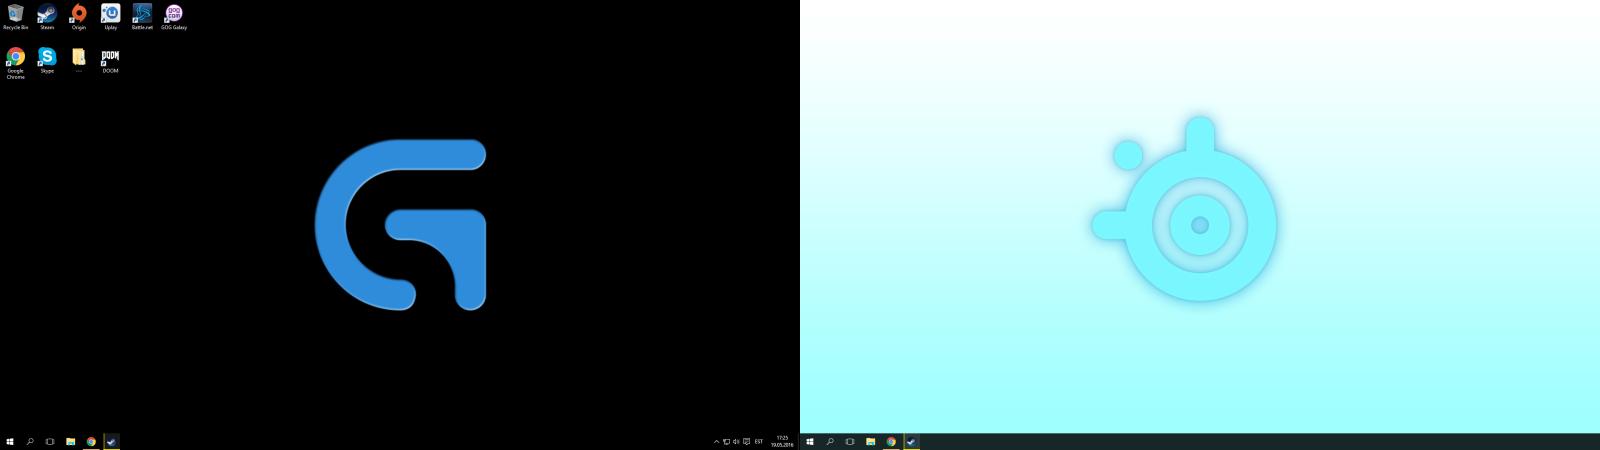 Postita enda arvuti Desktop - Page 3 2urs9iw